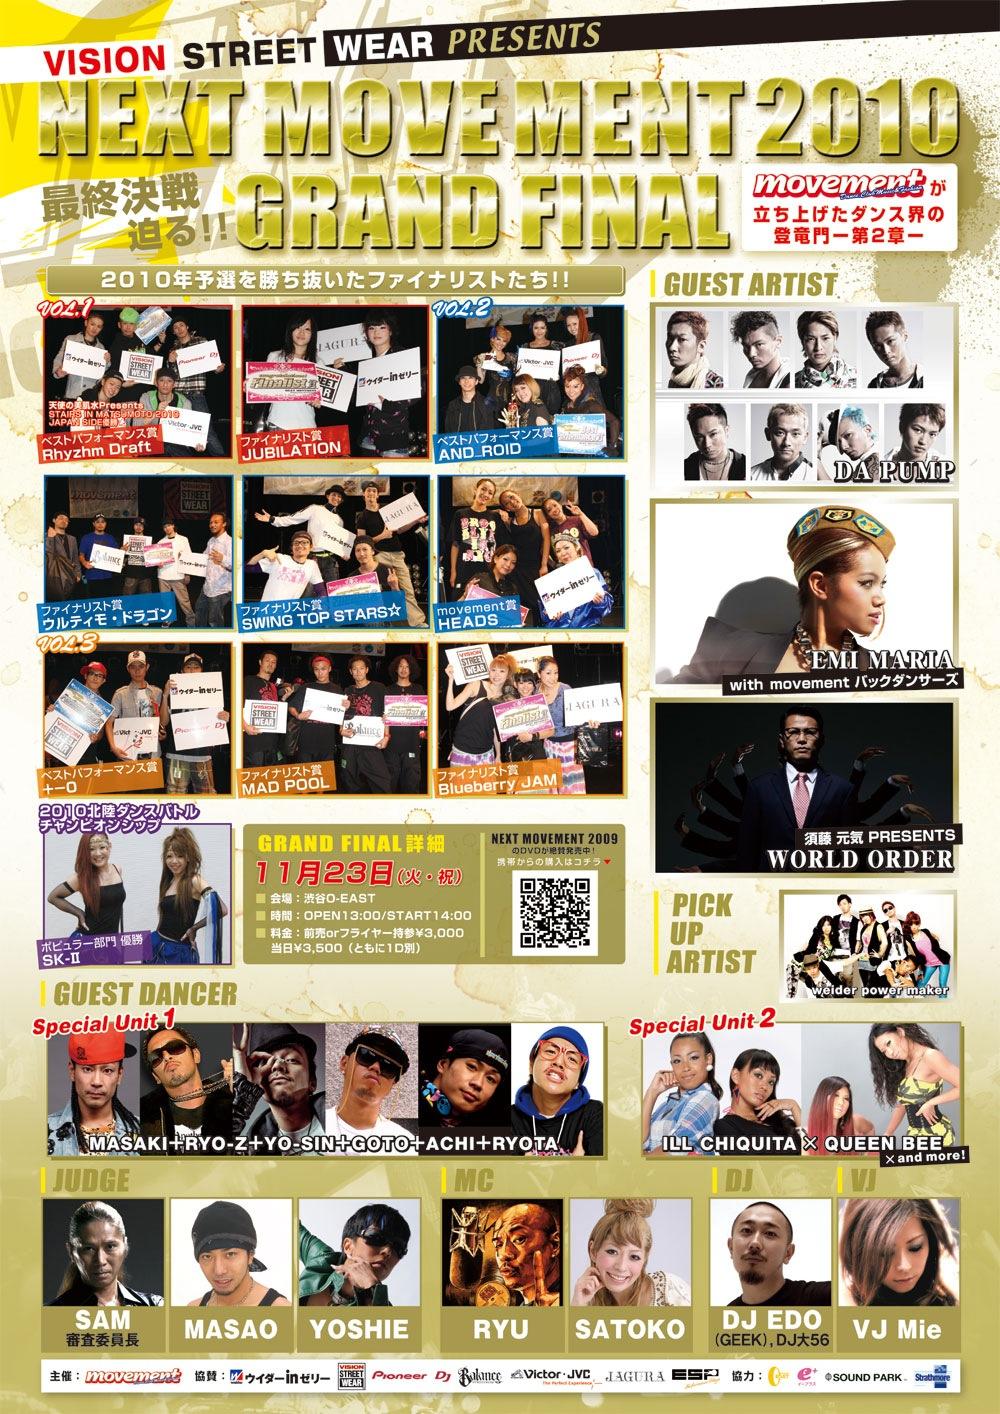 http://www.aasd.jp/wp-content/uploads/nm2010_gf1.jpg